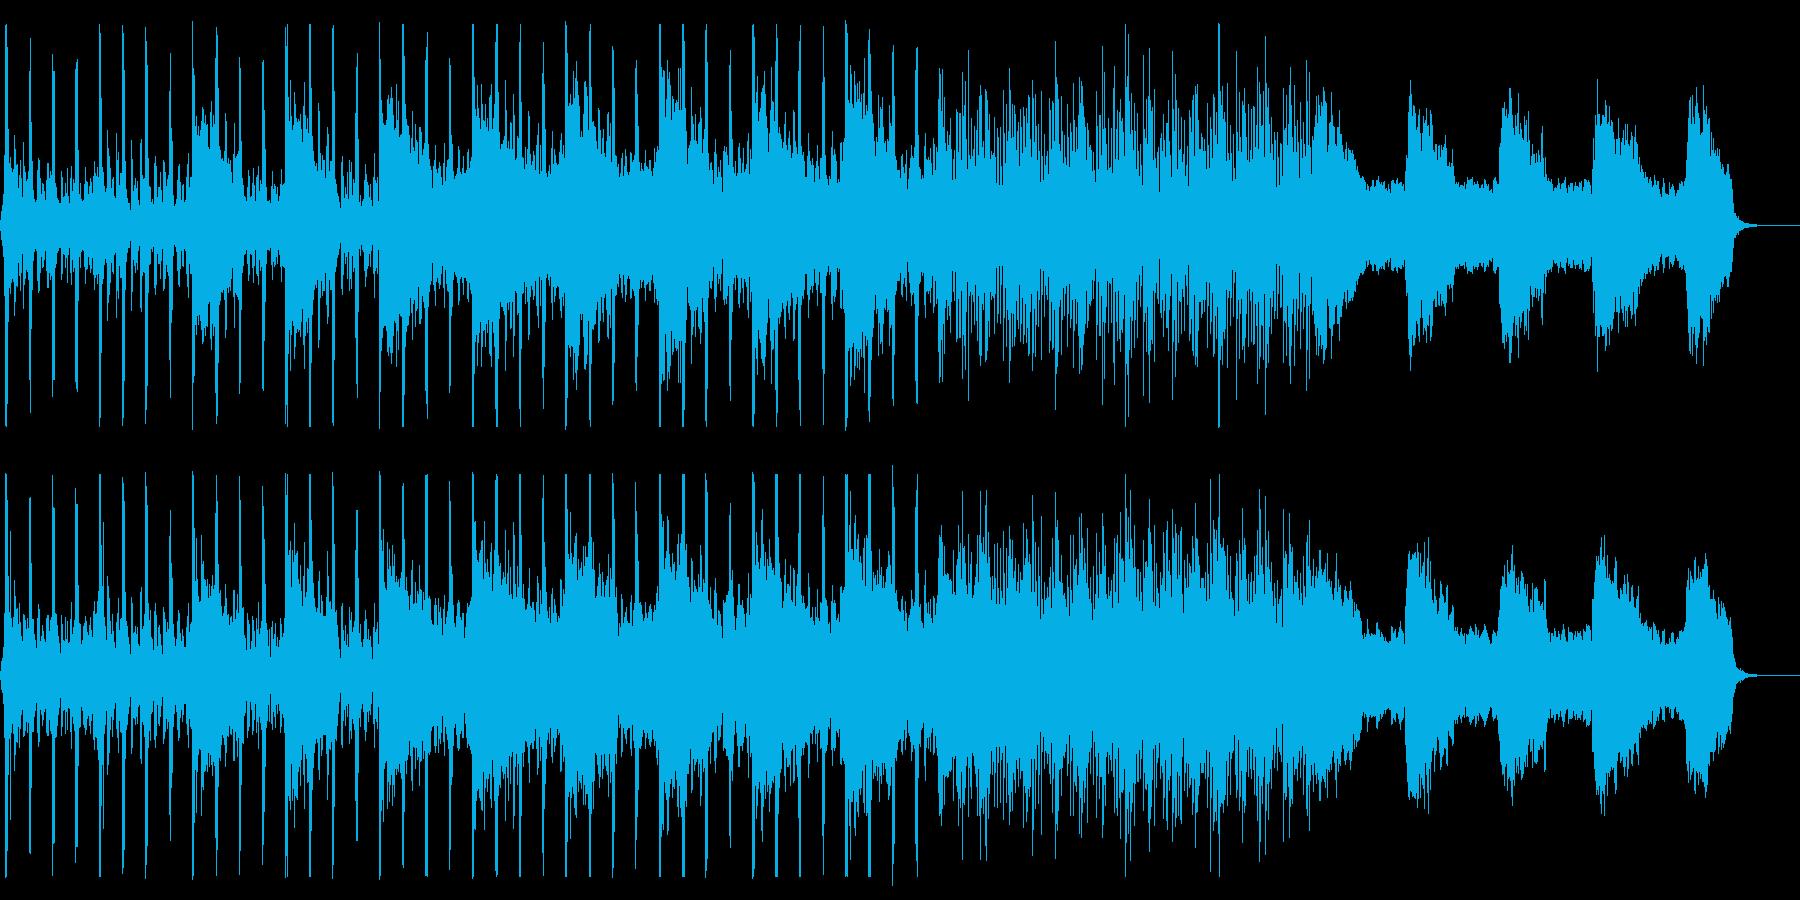 Ruthless percussionの再生済みの波形